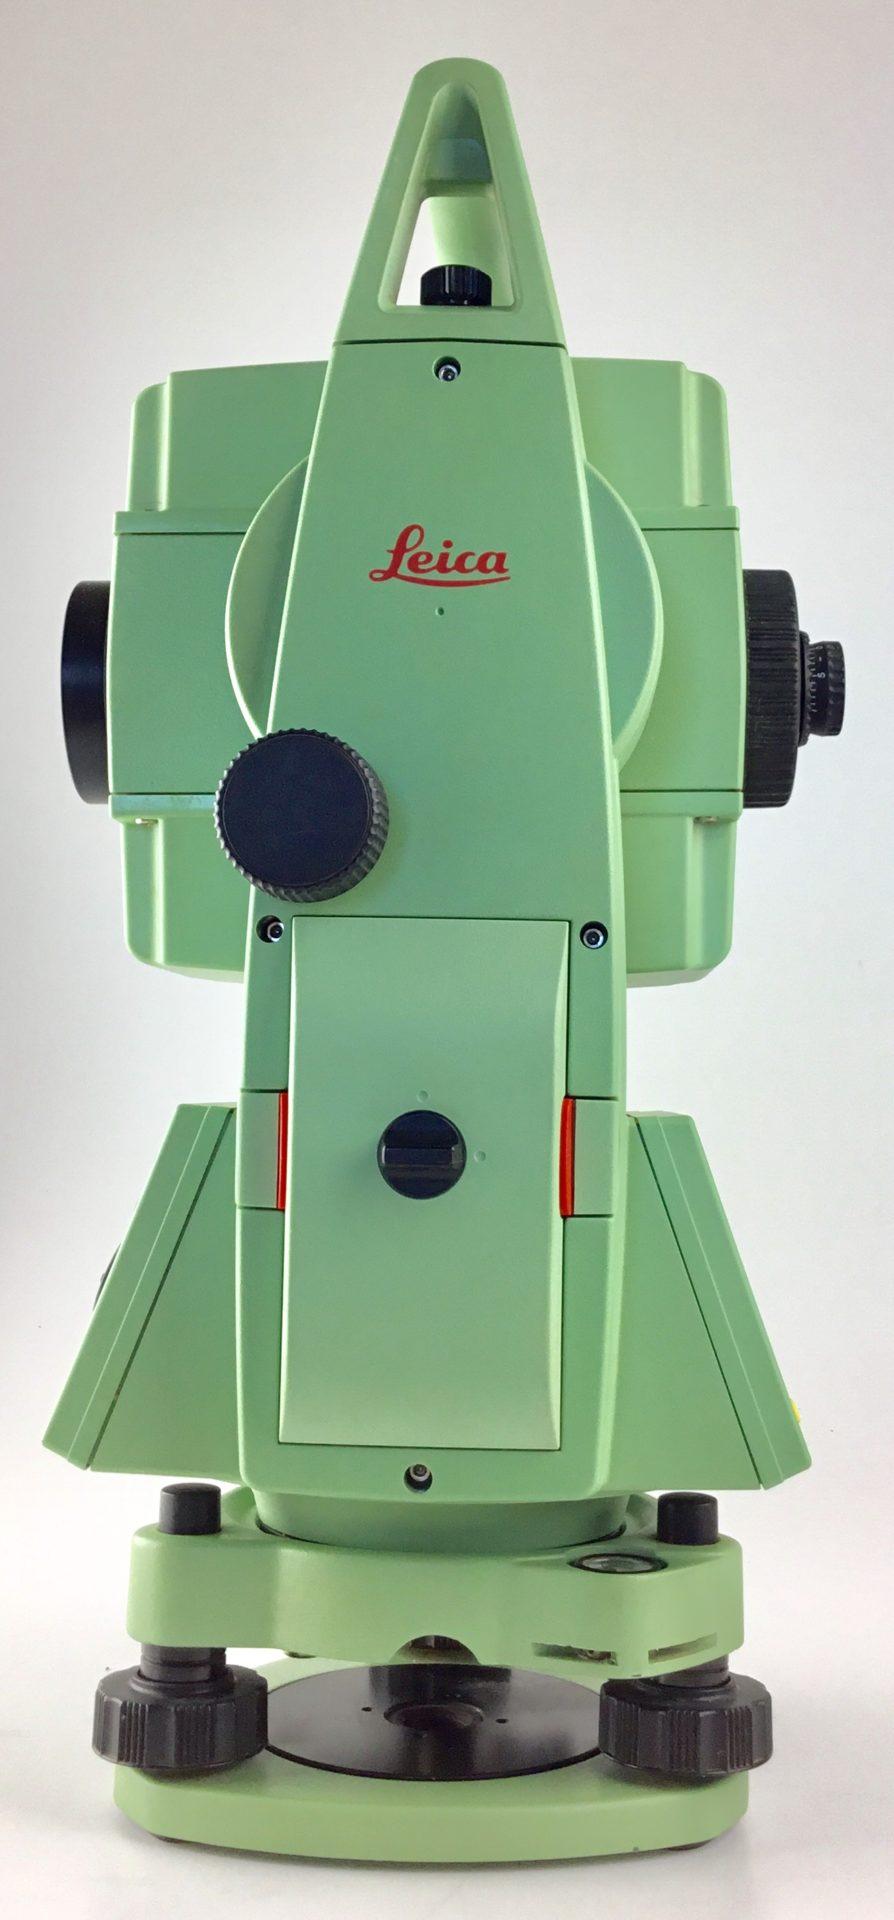 Leica Tcr 405 Power 5 U201d Reflectorless Total Station